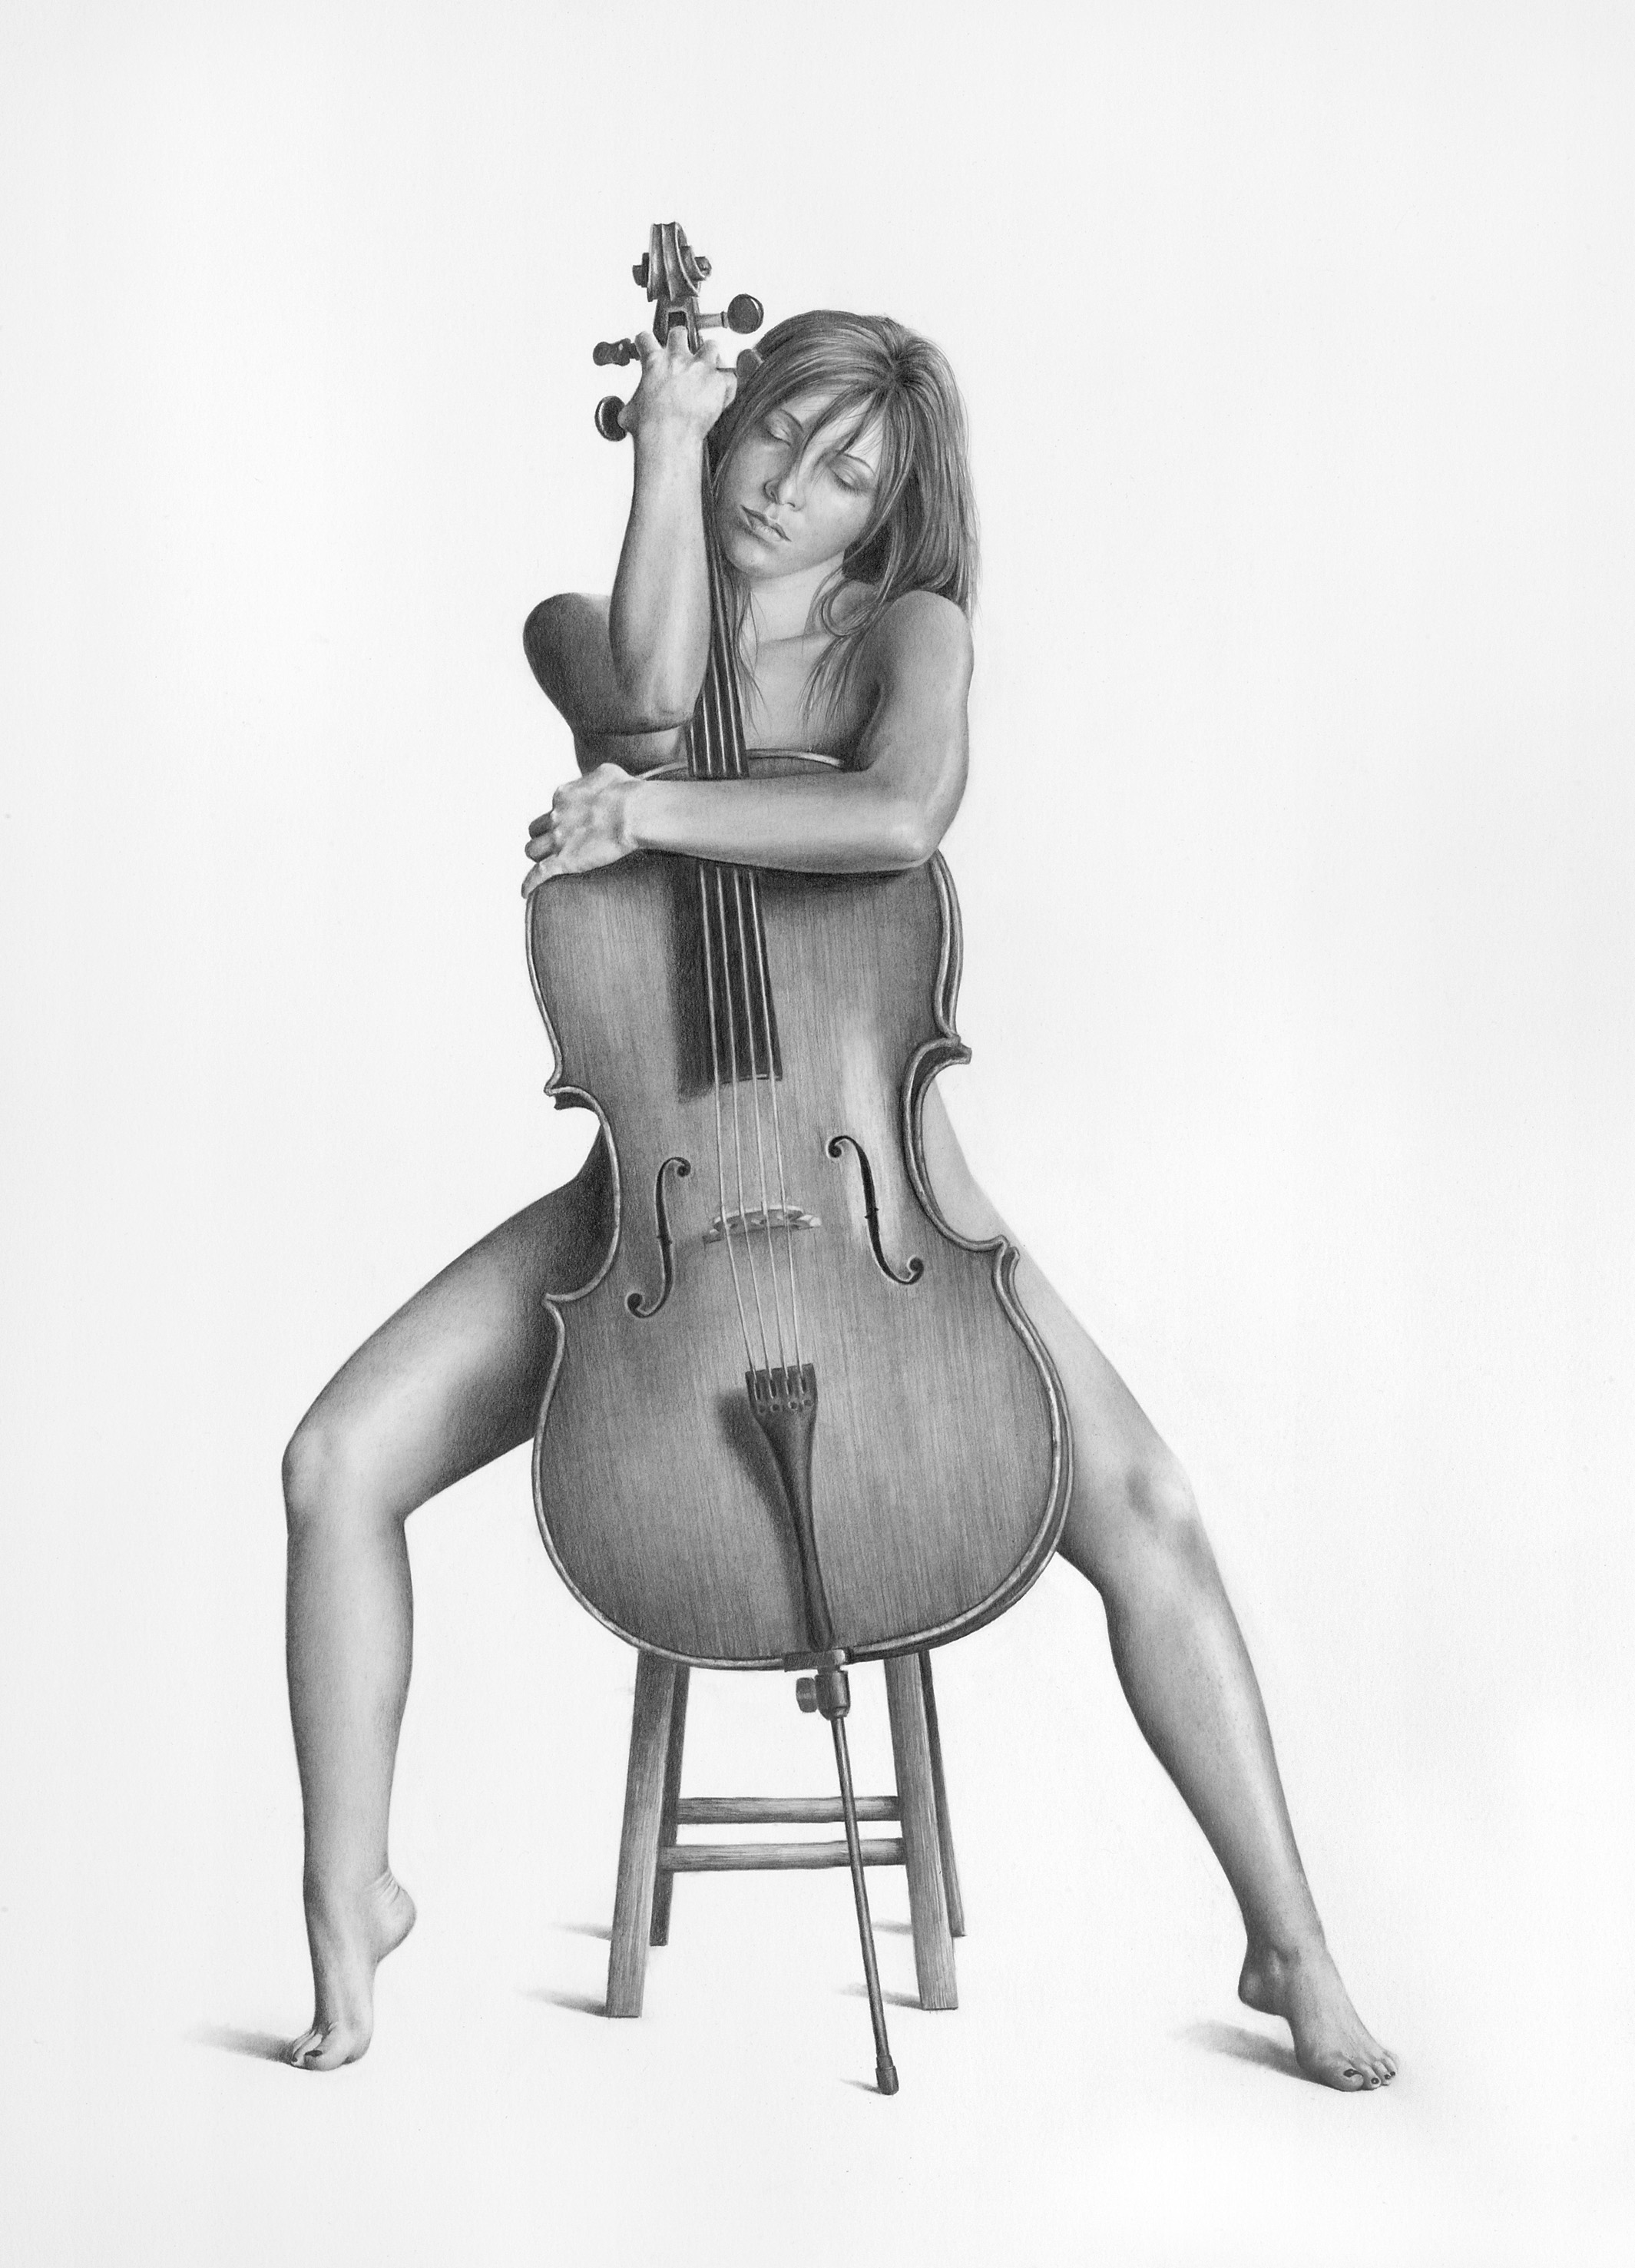 bill_higginson-the love of artbill-higginson-artist-graphite-drawing-realism-black-and-white